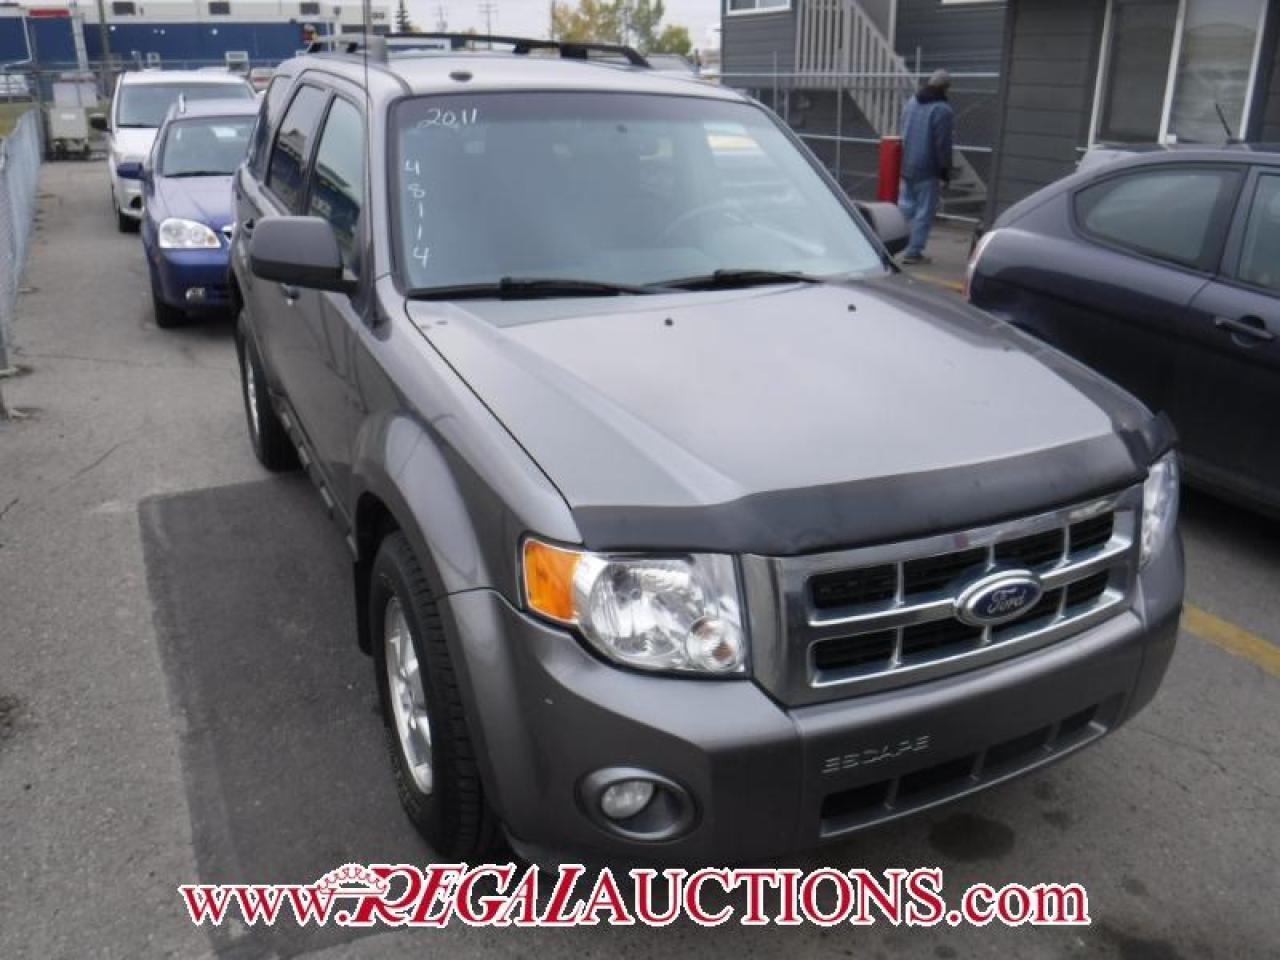 Photo of Grey 2011 Ford Escape